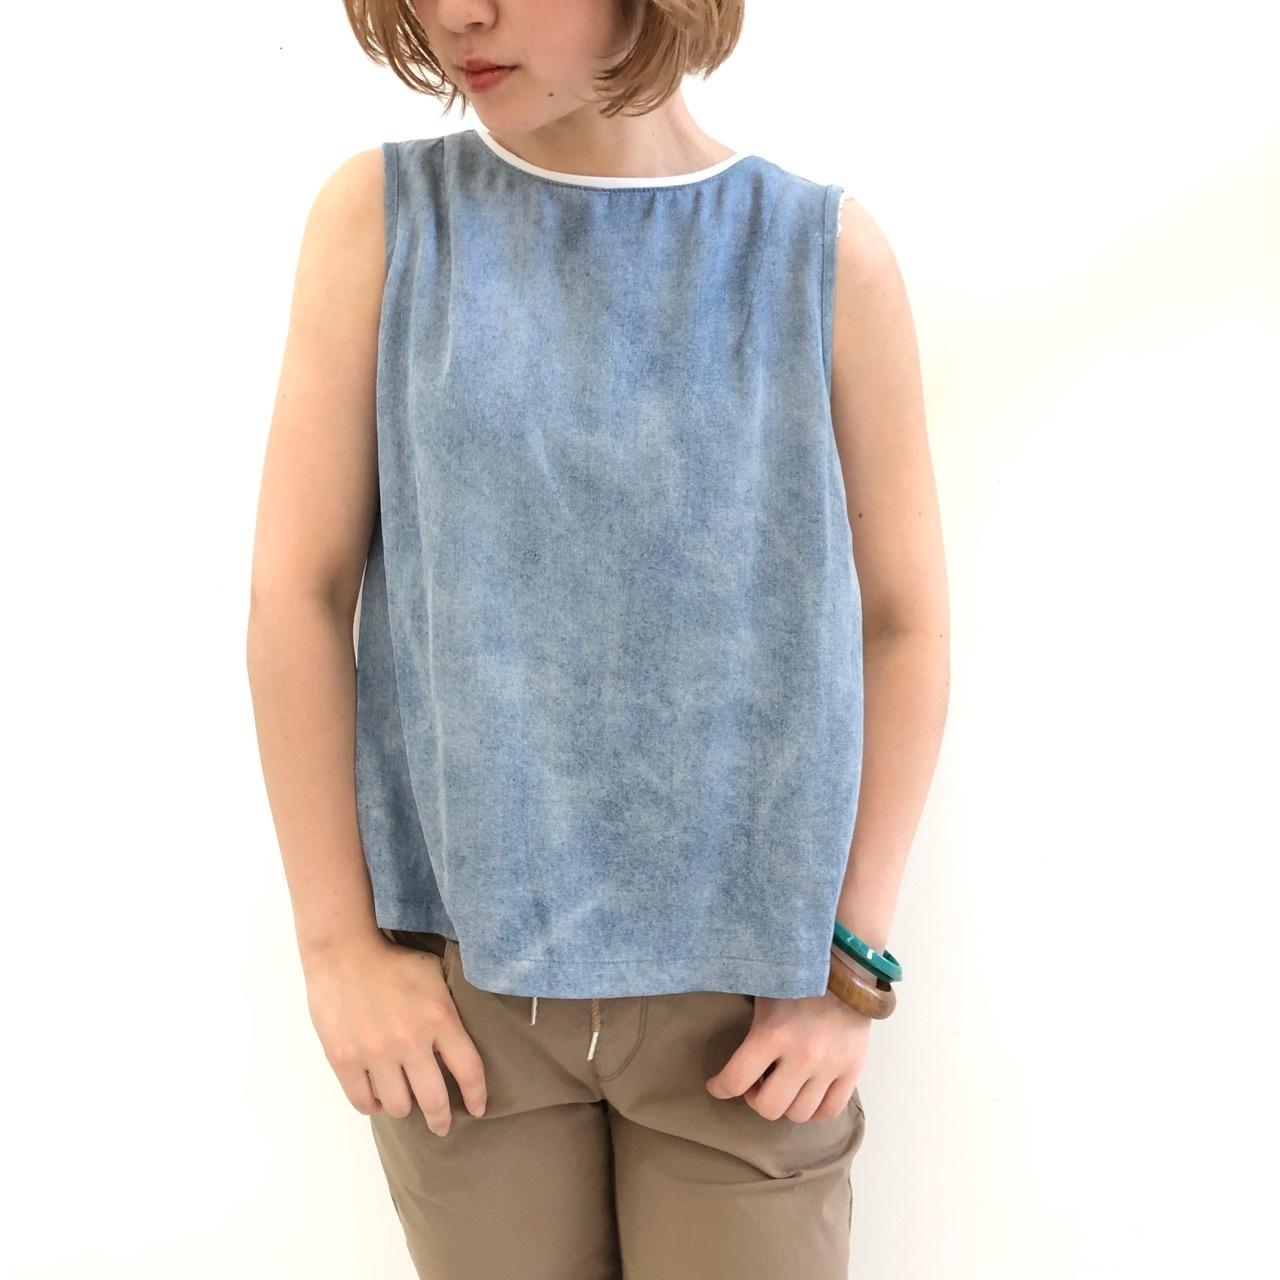 【 Praia 】- LEI-1940 - プリーツノースリーブTeeシャツ